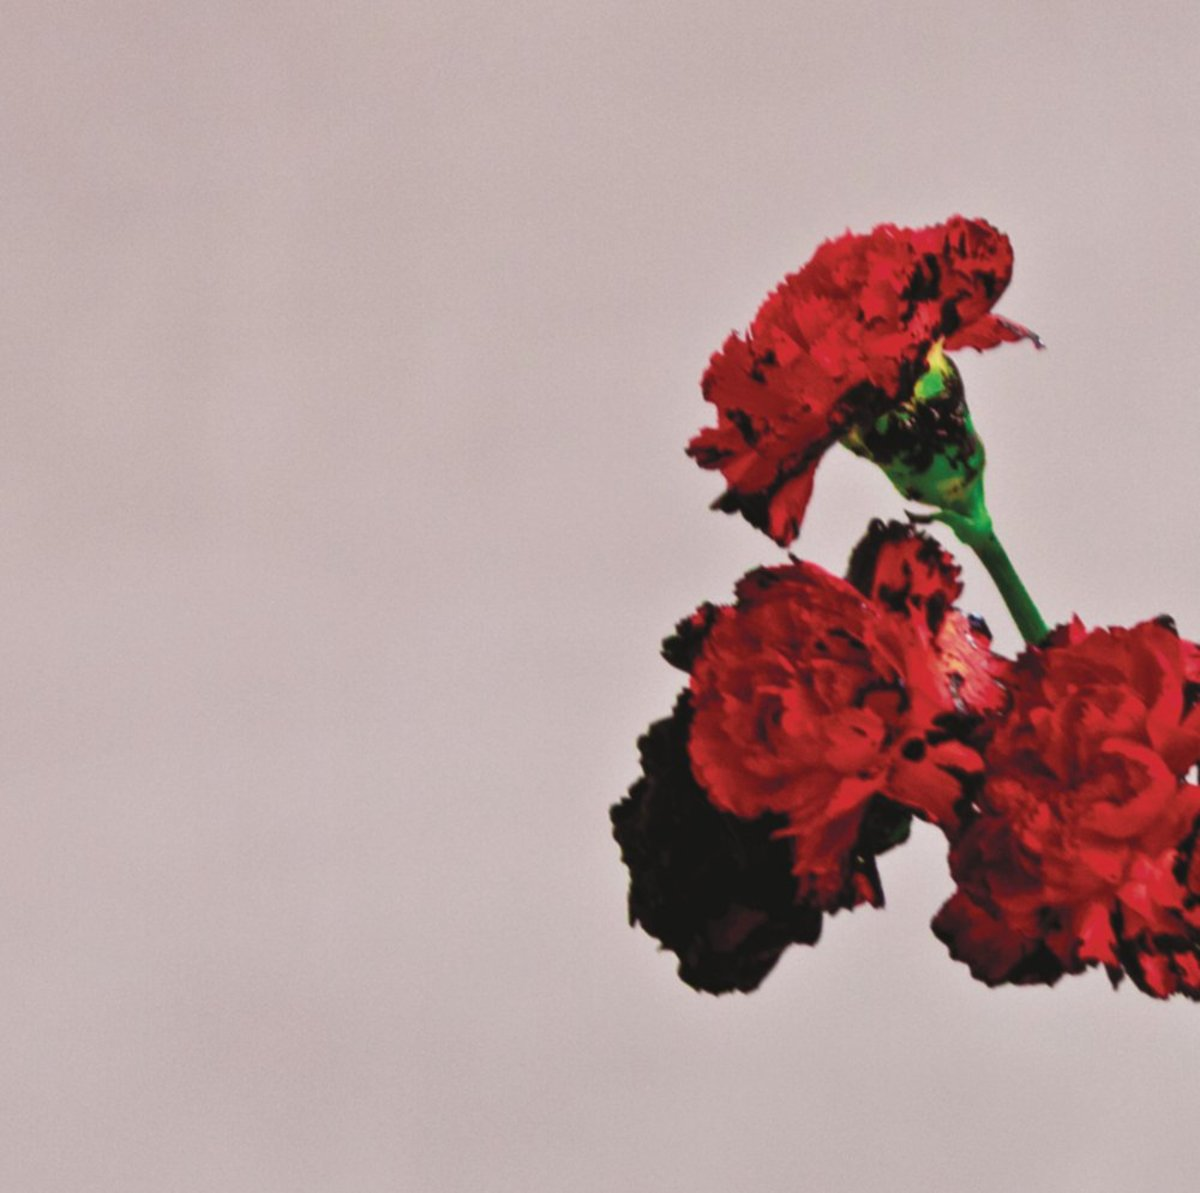 """You & I"" by John Legend"